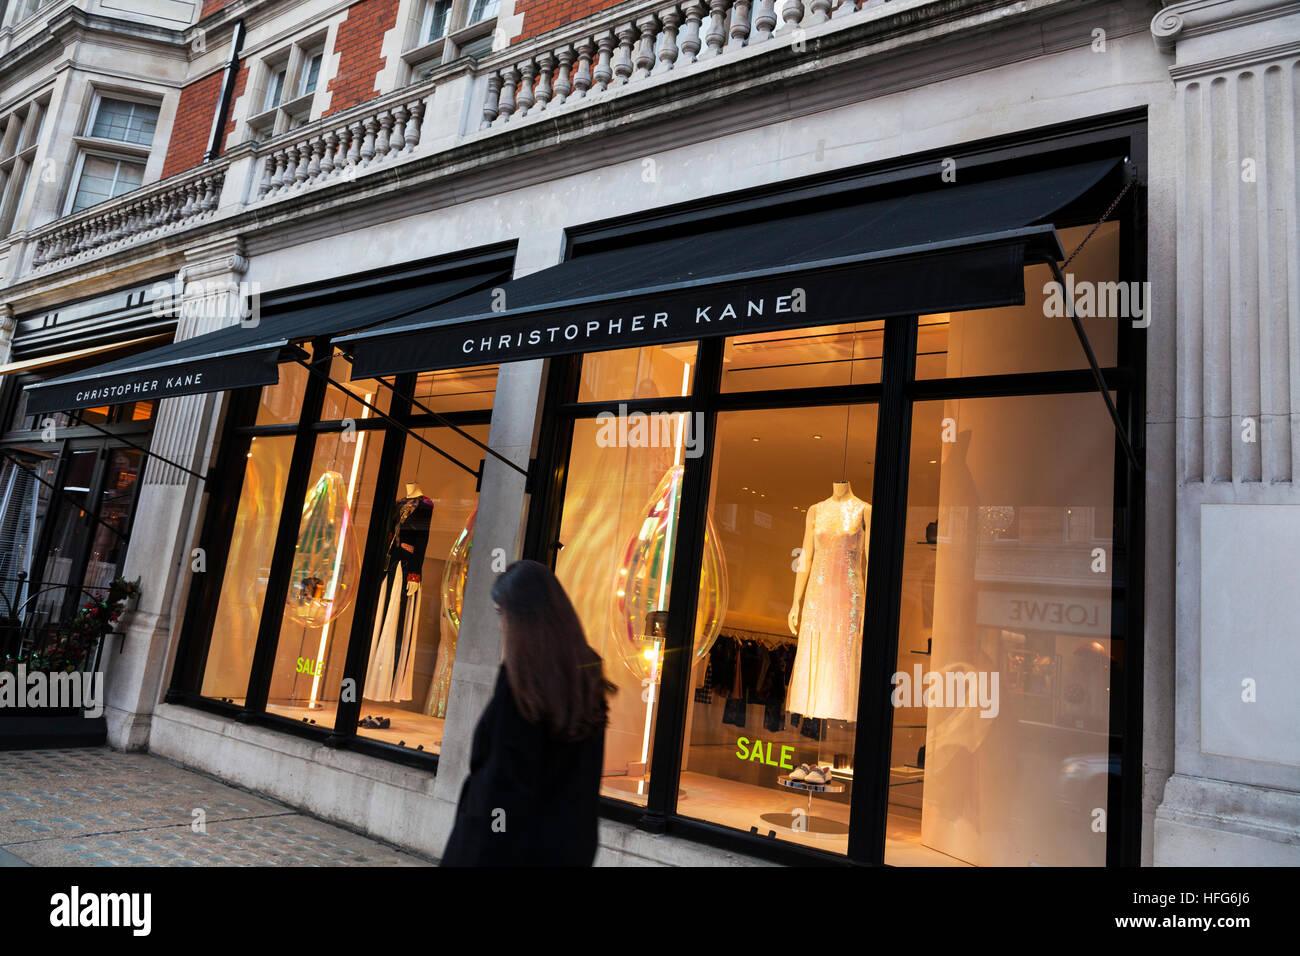 Christopher Kane designer clothes store on Mount Street in Mayfair, London - Stock Image